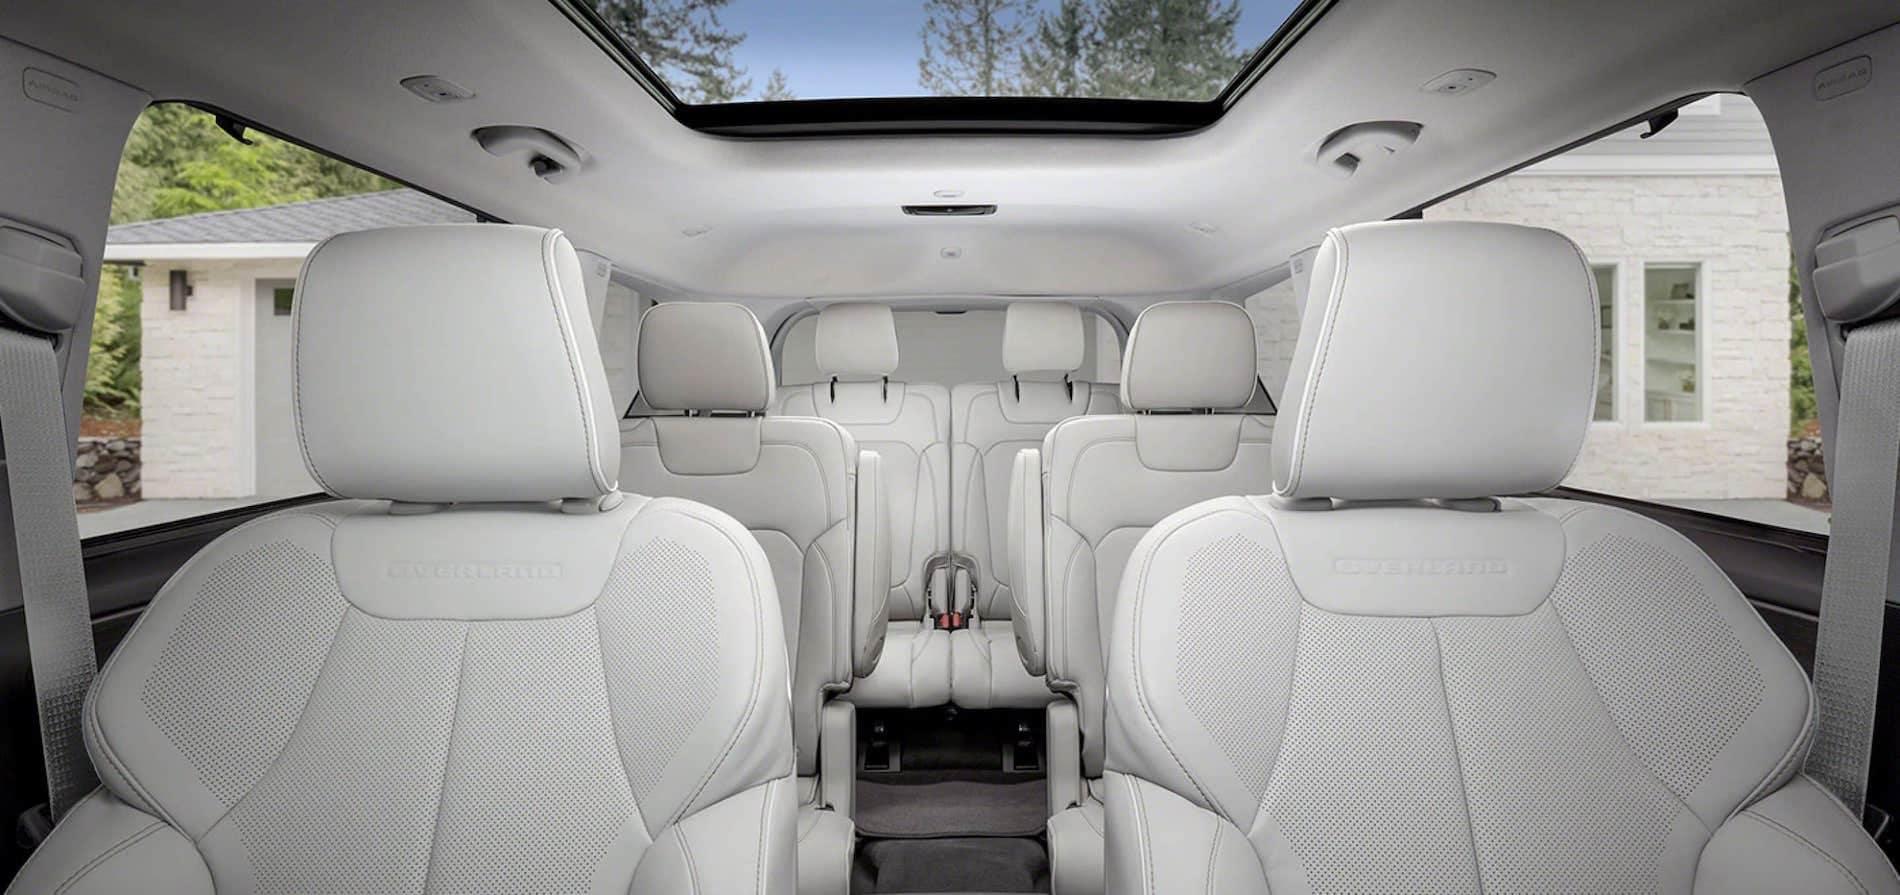 2021 Jeep Grande Cherokee L Interior available in Springfield VA